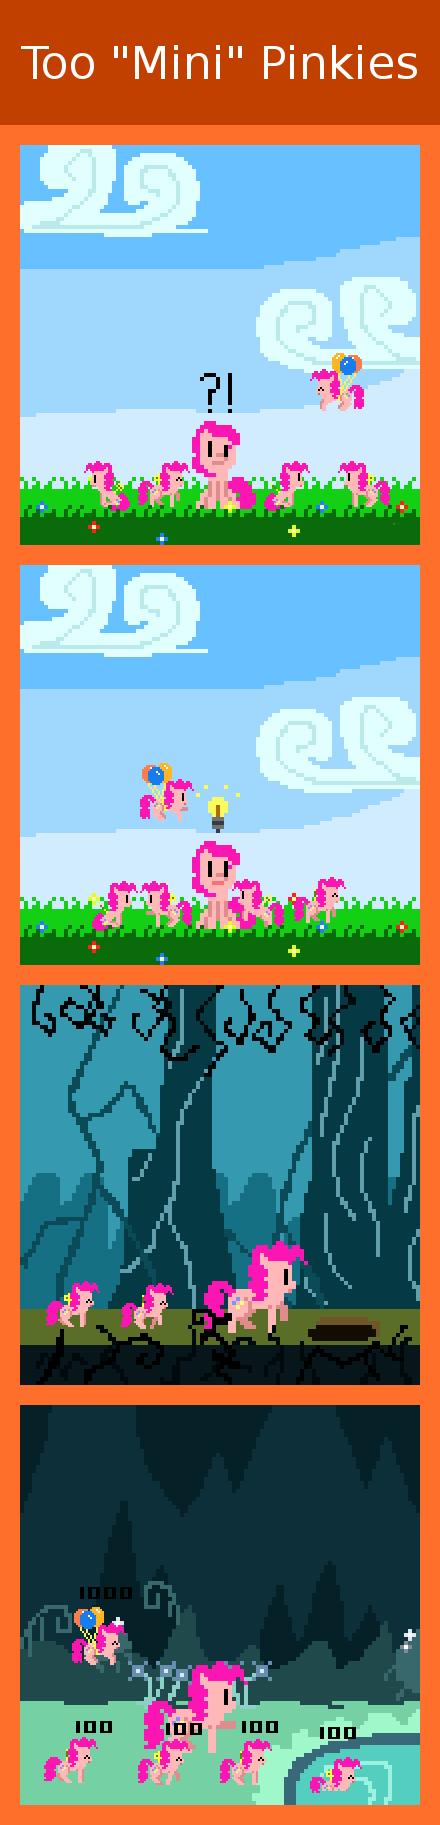 "Too ""Mini"" Pinkies. via zztfox.deviantart.com/#/d5o2g7yfun Pinkie disposes of her Mini clones the Mario vs Donkey Kong way! MLP FiM and Pinkie Pie copyright Fau My Little Pony Pinkie retro pony pixel Mario Nintendo comic"